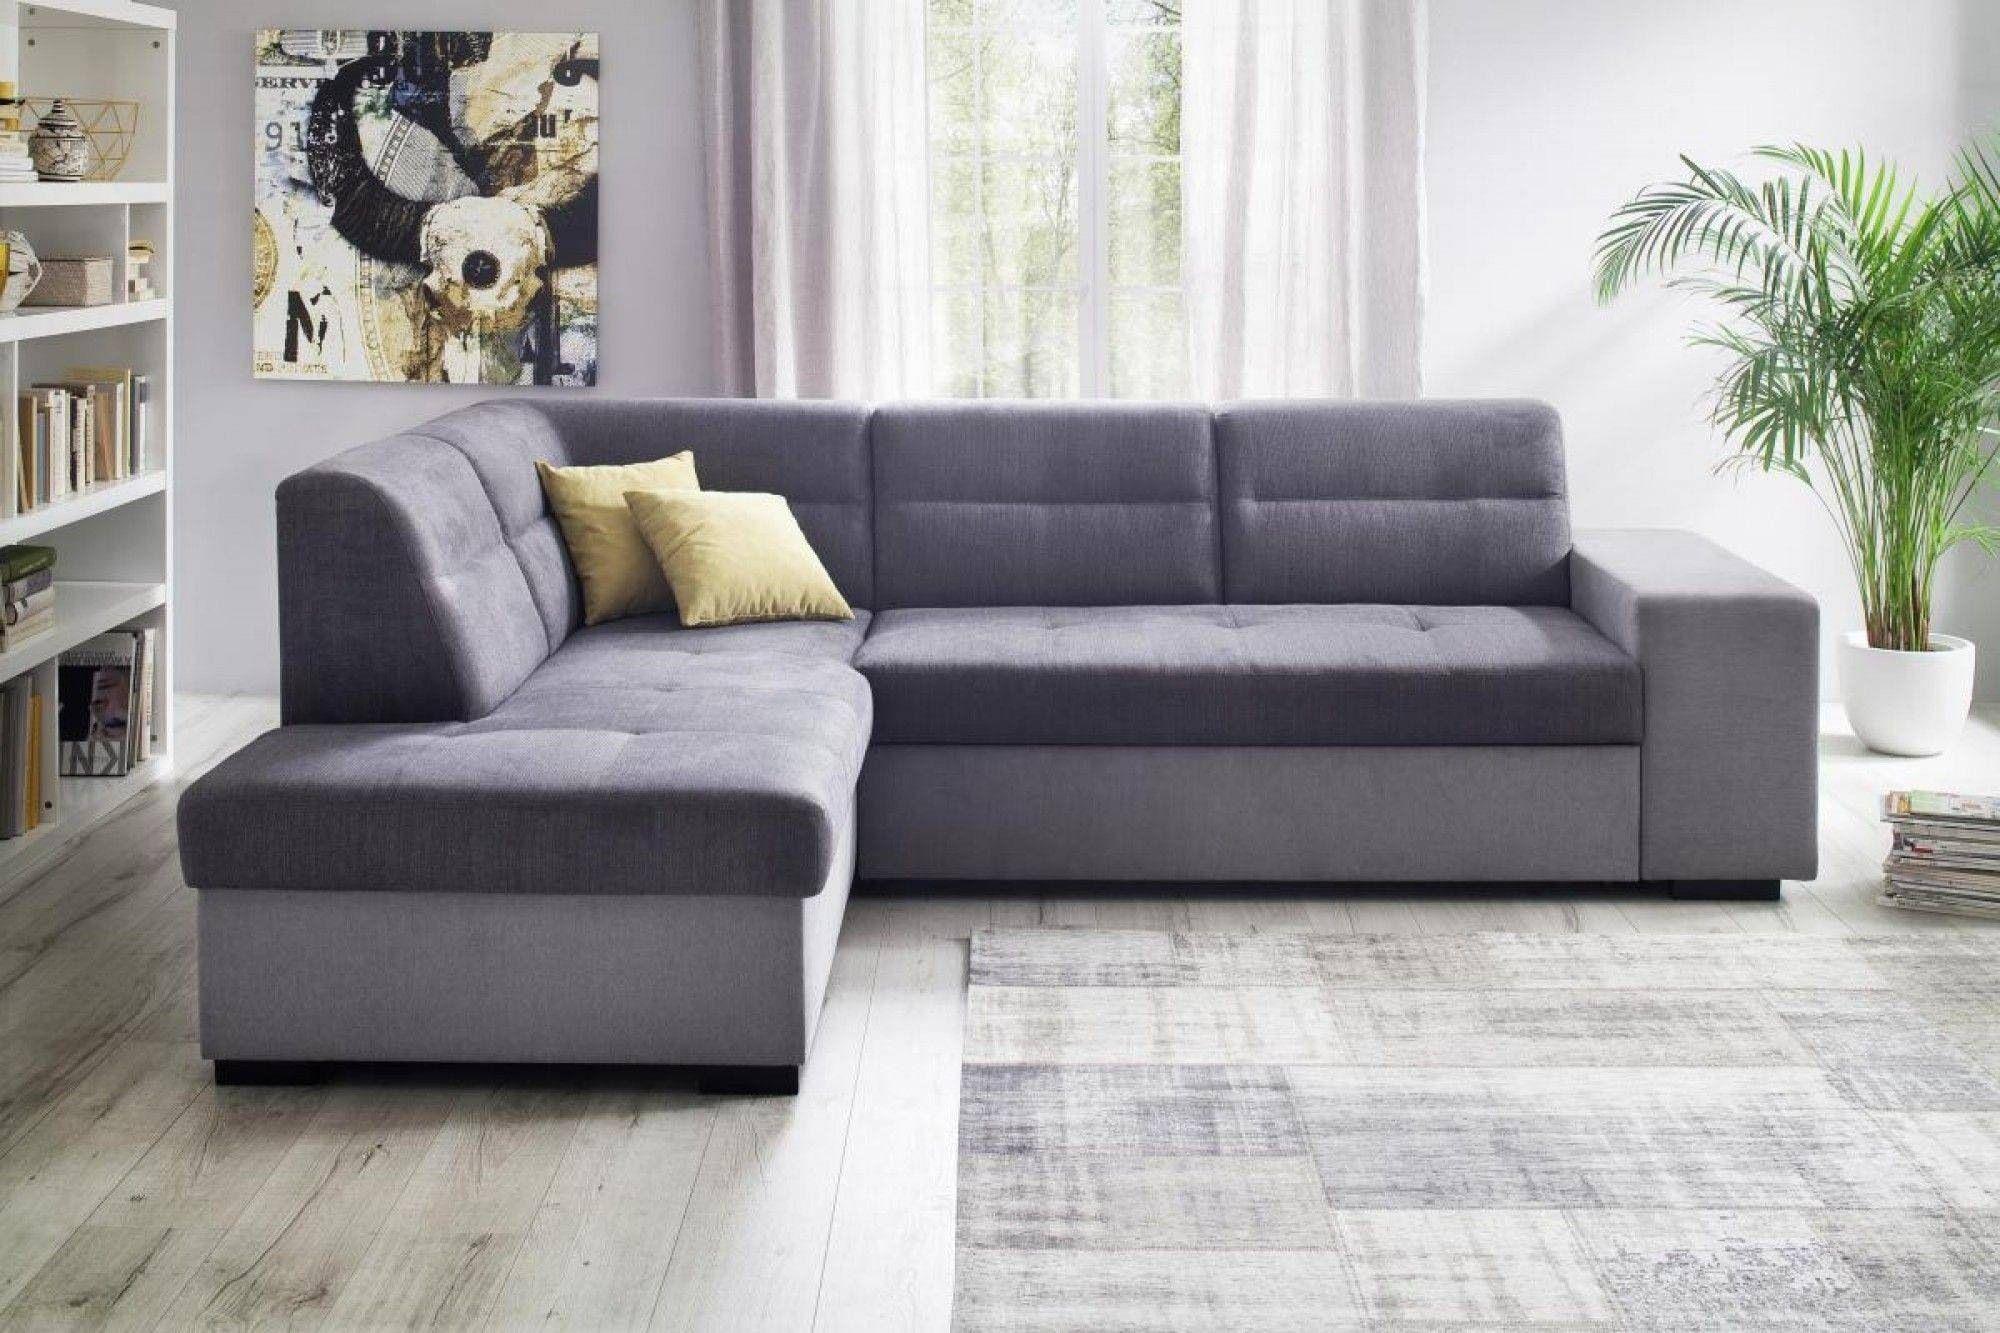 Poco Schlafsofa Einzigartig Sofas Poco Neu Gunstig Sofa Kaufen